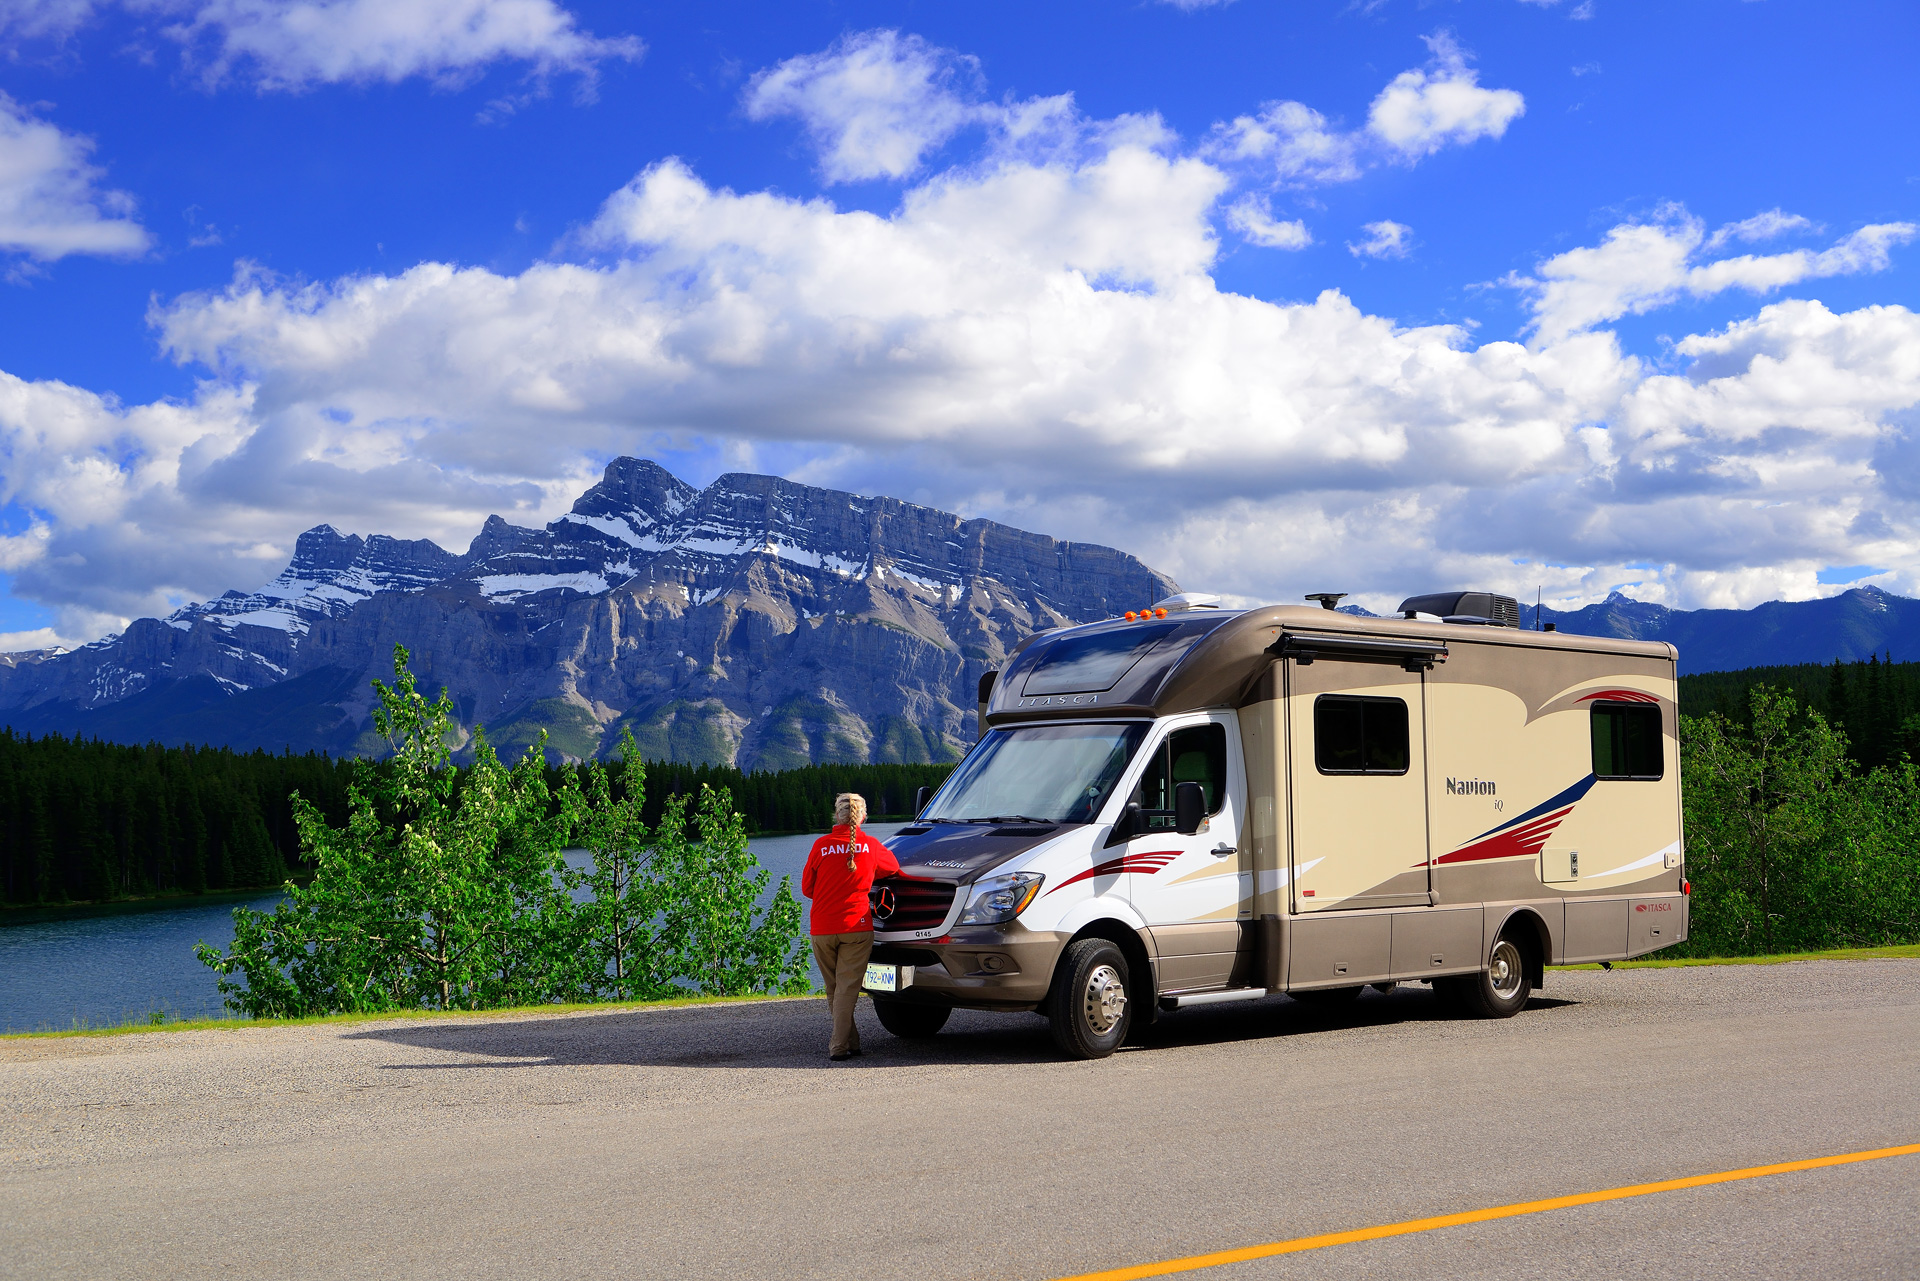 kanada spezialist sk touristik von vancouver nach calgary. Black Bedroom Furniture Sets. Home Design Ideas